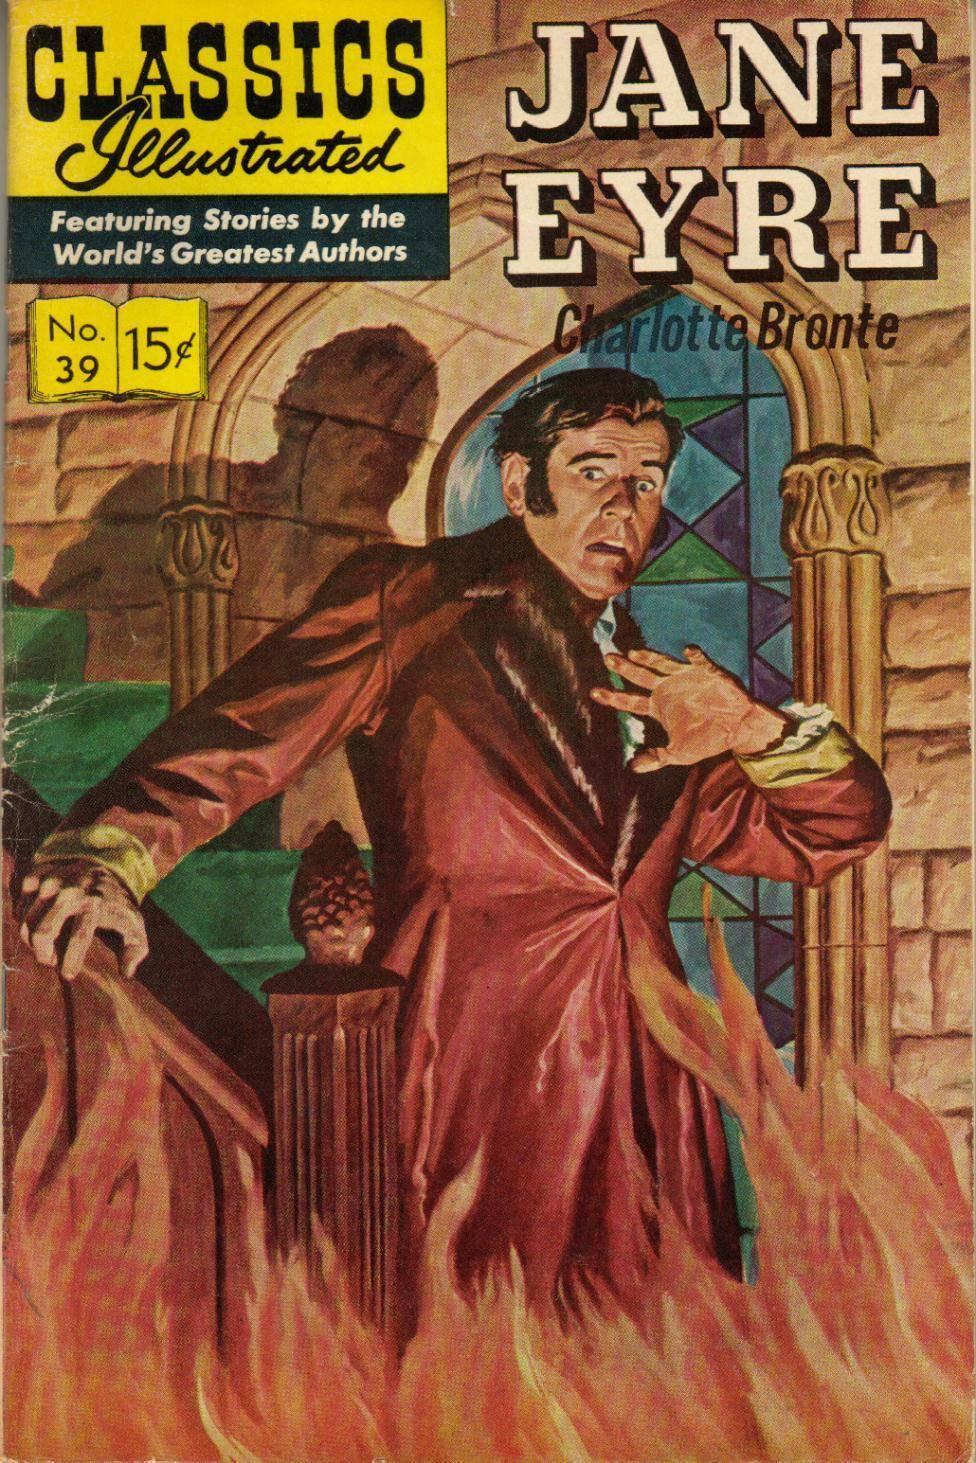 For Spectre99 - Classics Illustrated 039 Jane Eyre Charlotte Bronte cbr